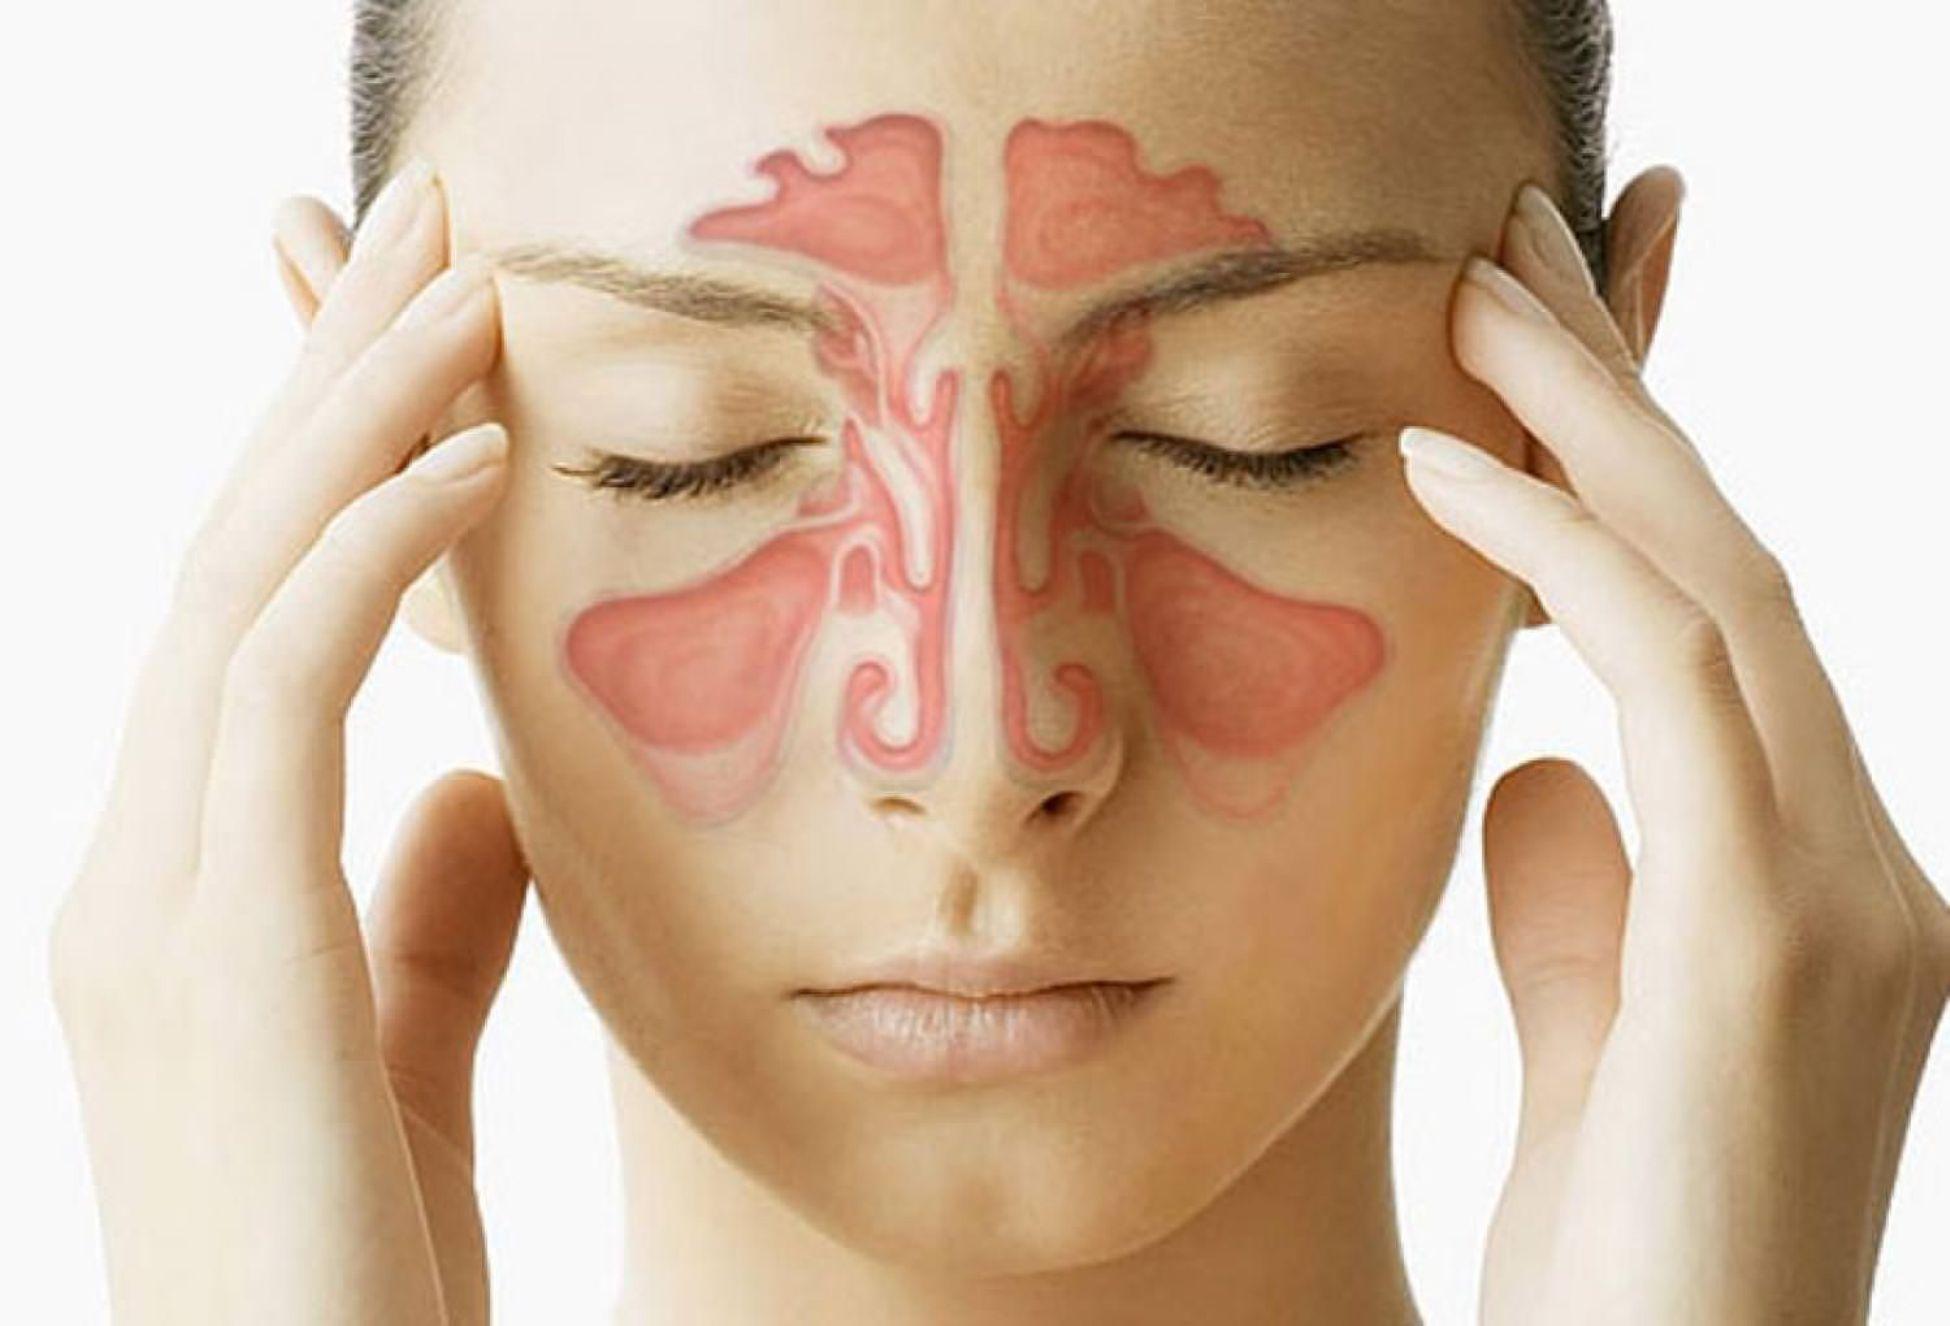 O alívio da sinusite através da acupuntura